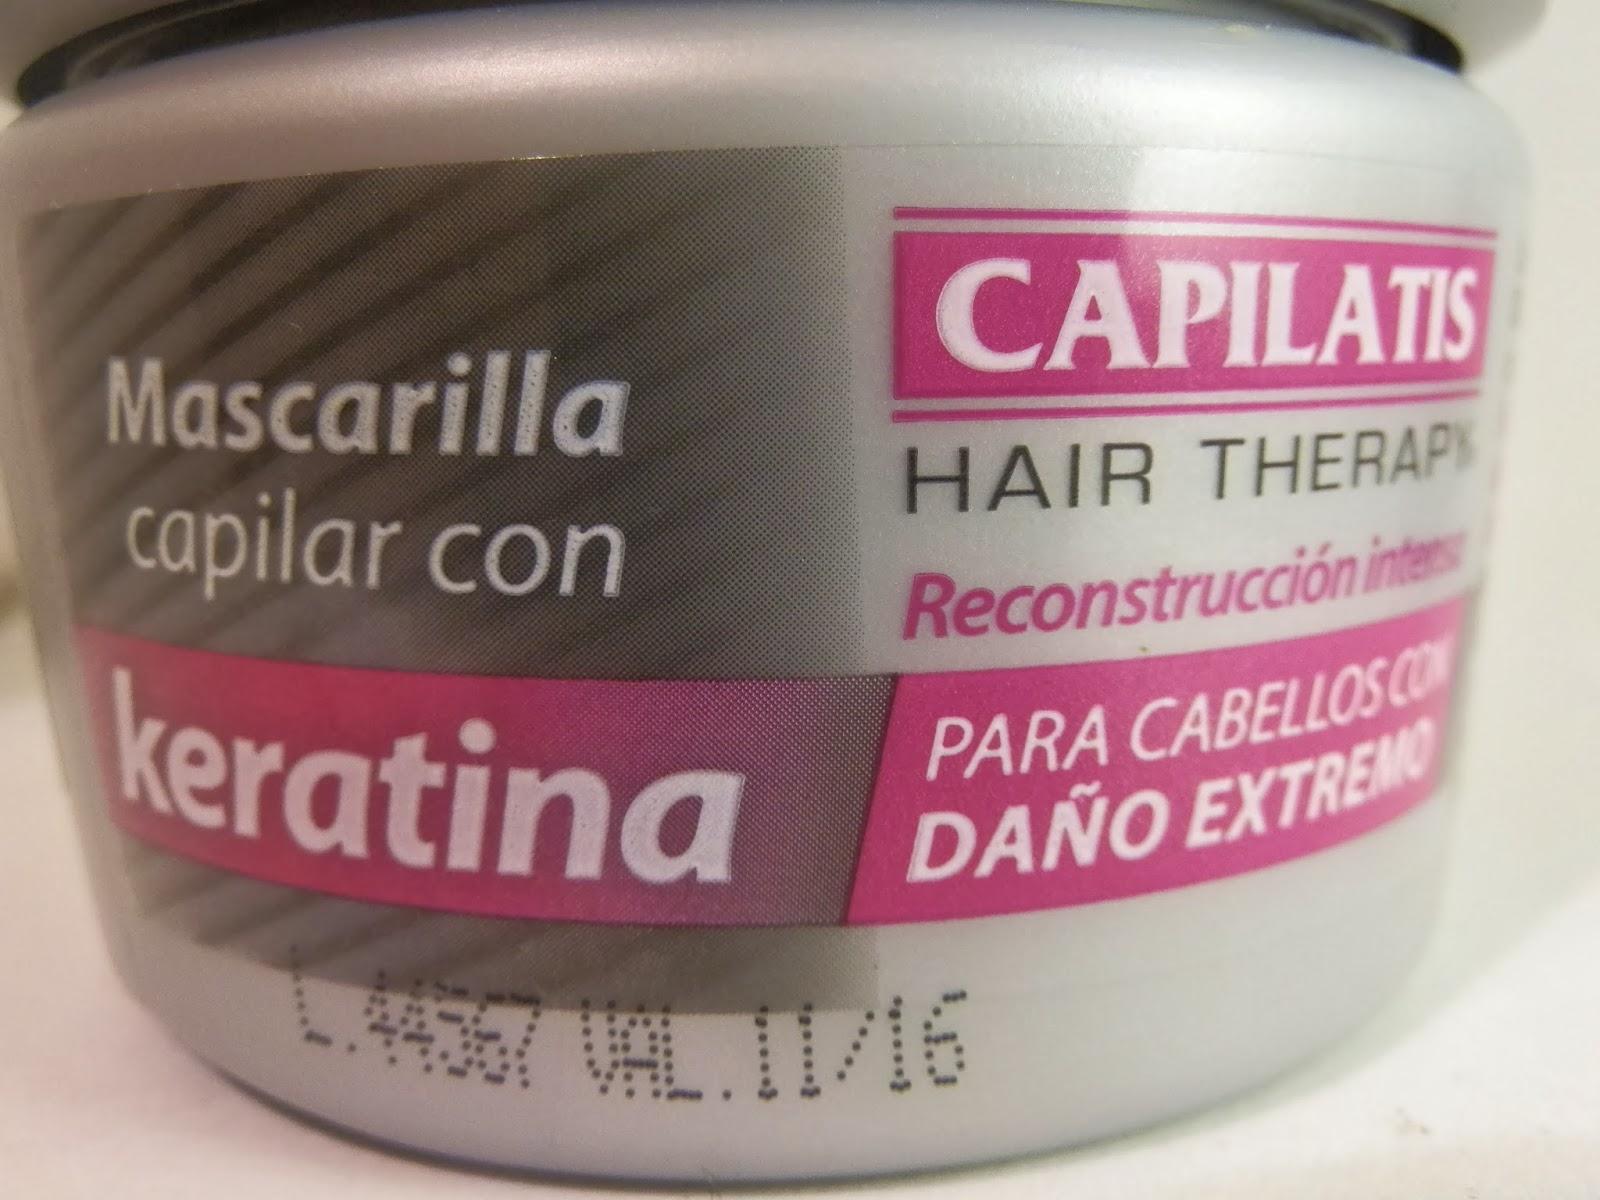 "<img alt=""keratina_capilatis_cabello"" src=""keratina_capilatis_cabello_tratamiento.jpg"" >"